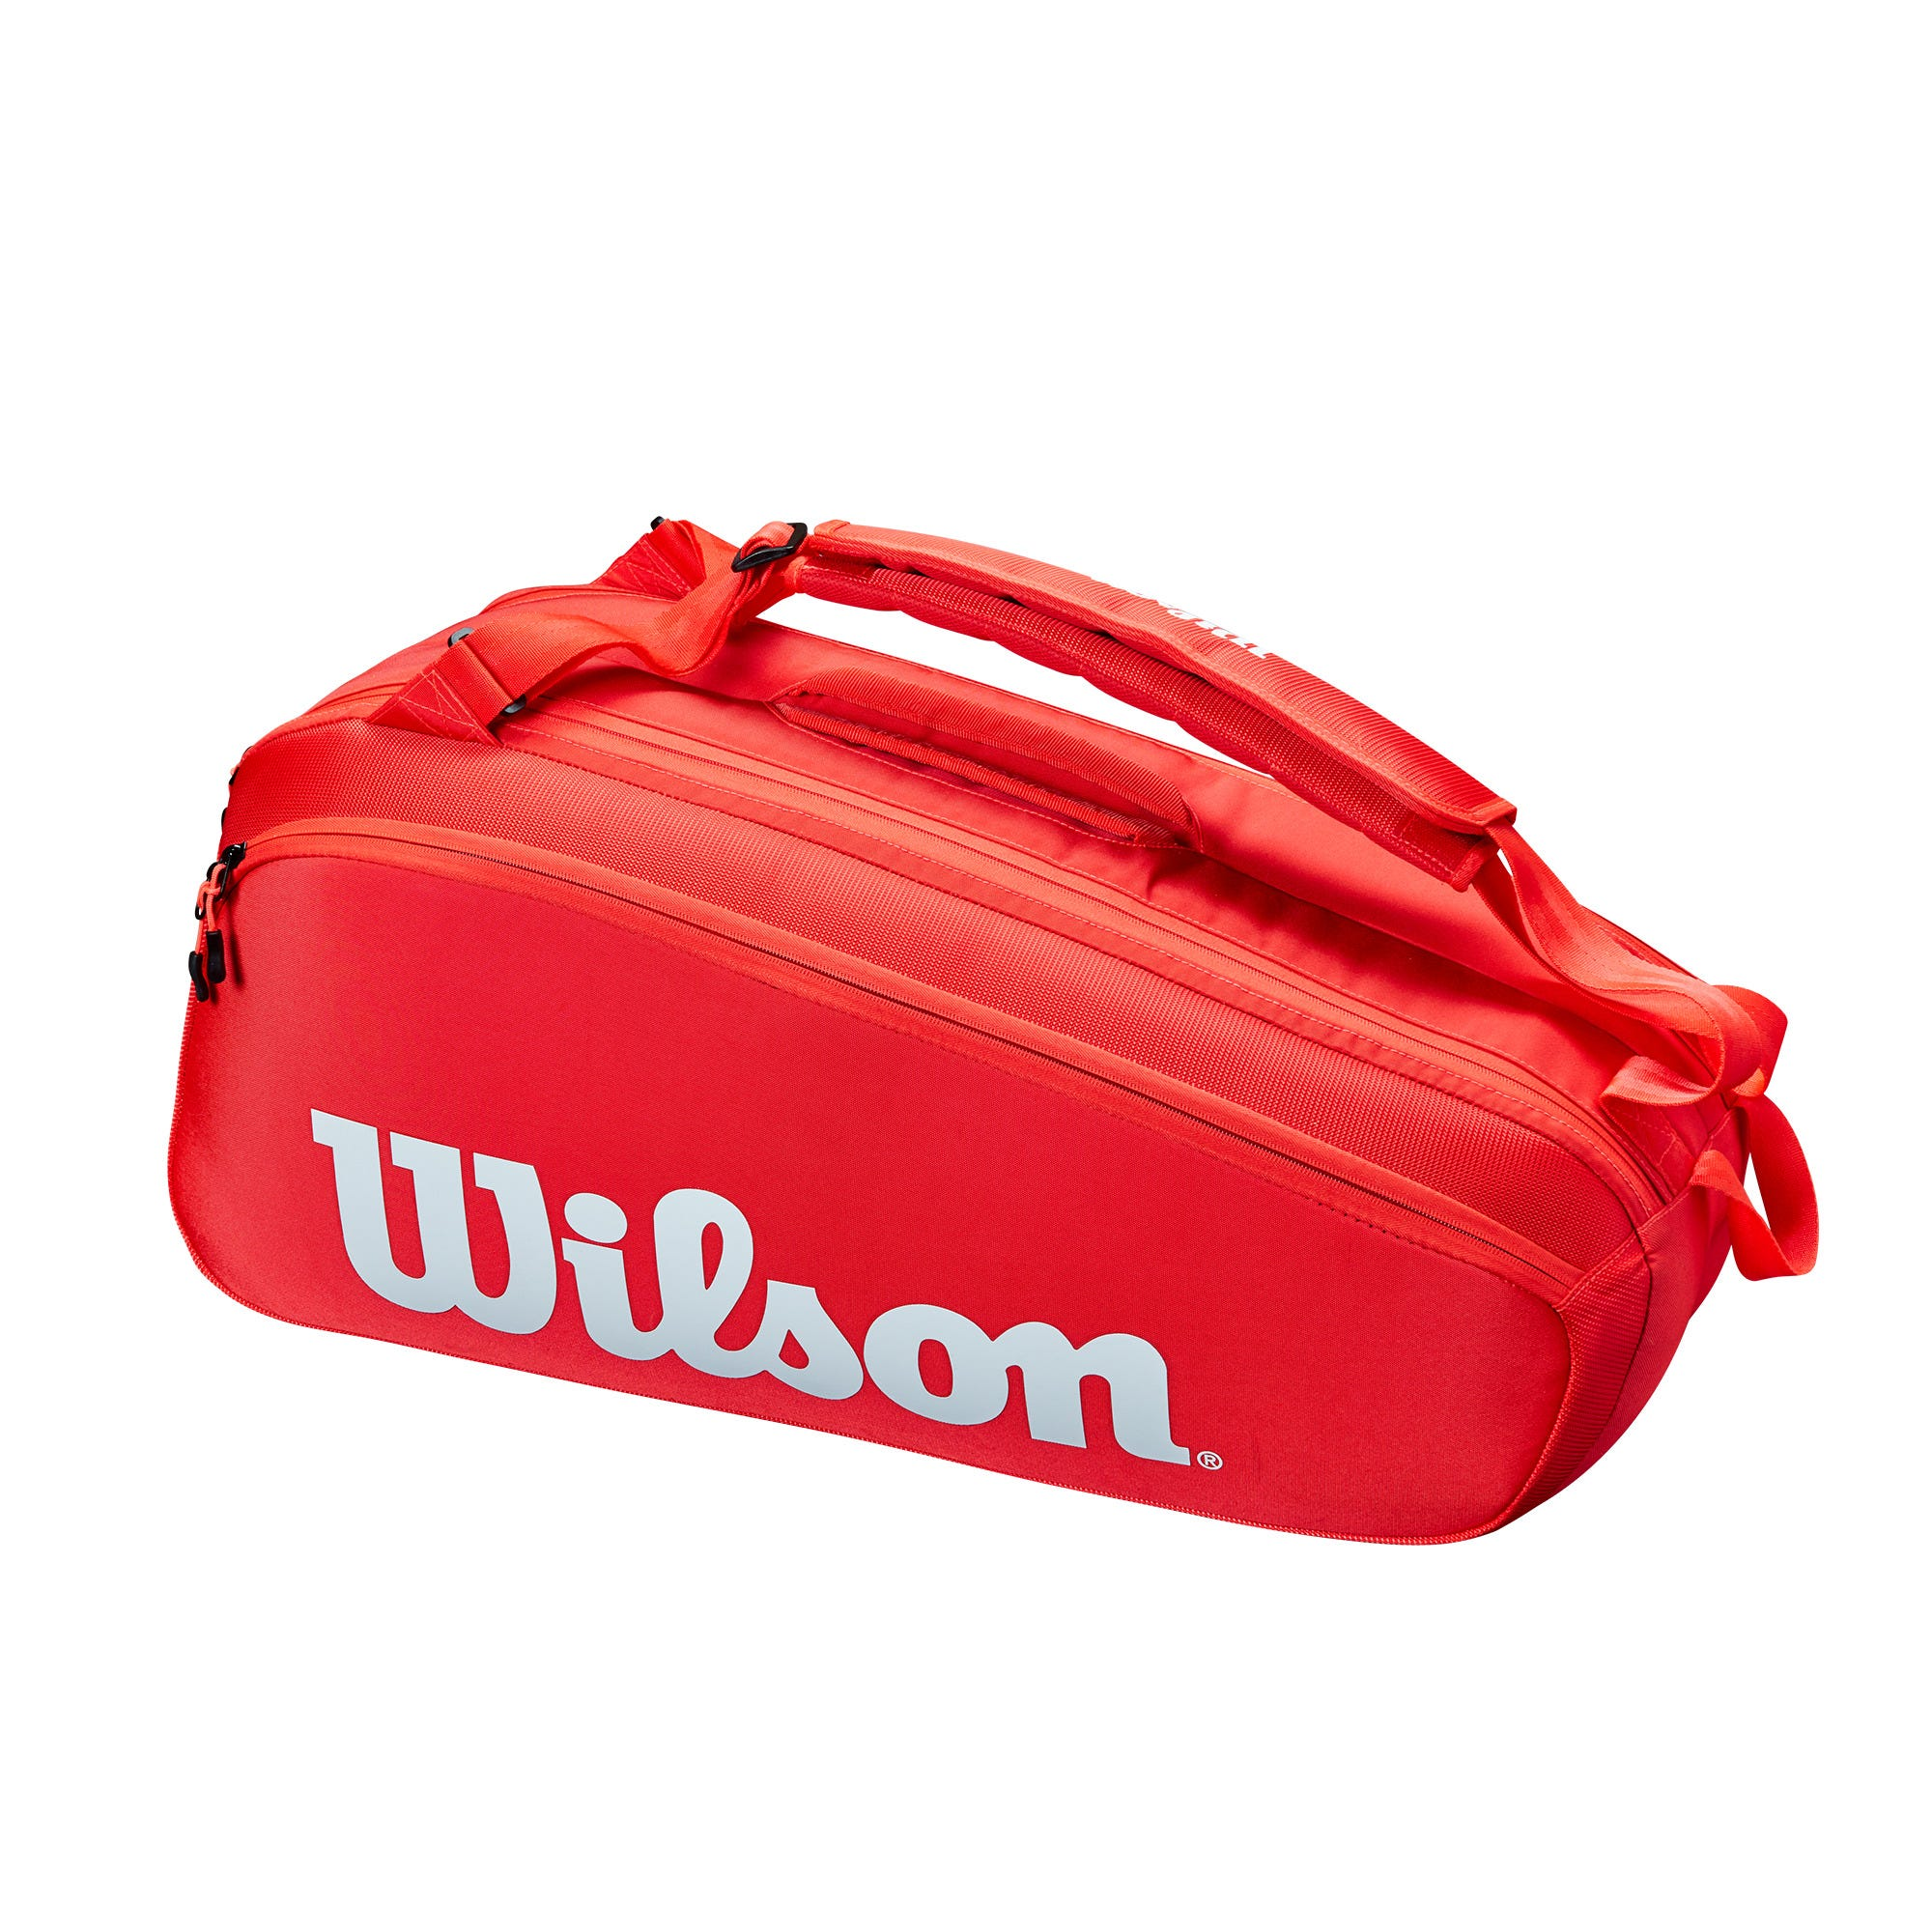 Super Tour 6 pack tennis bag